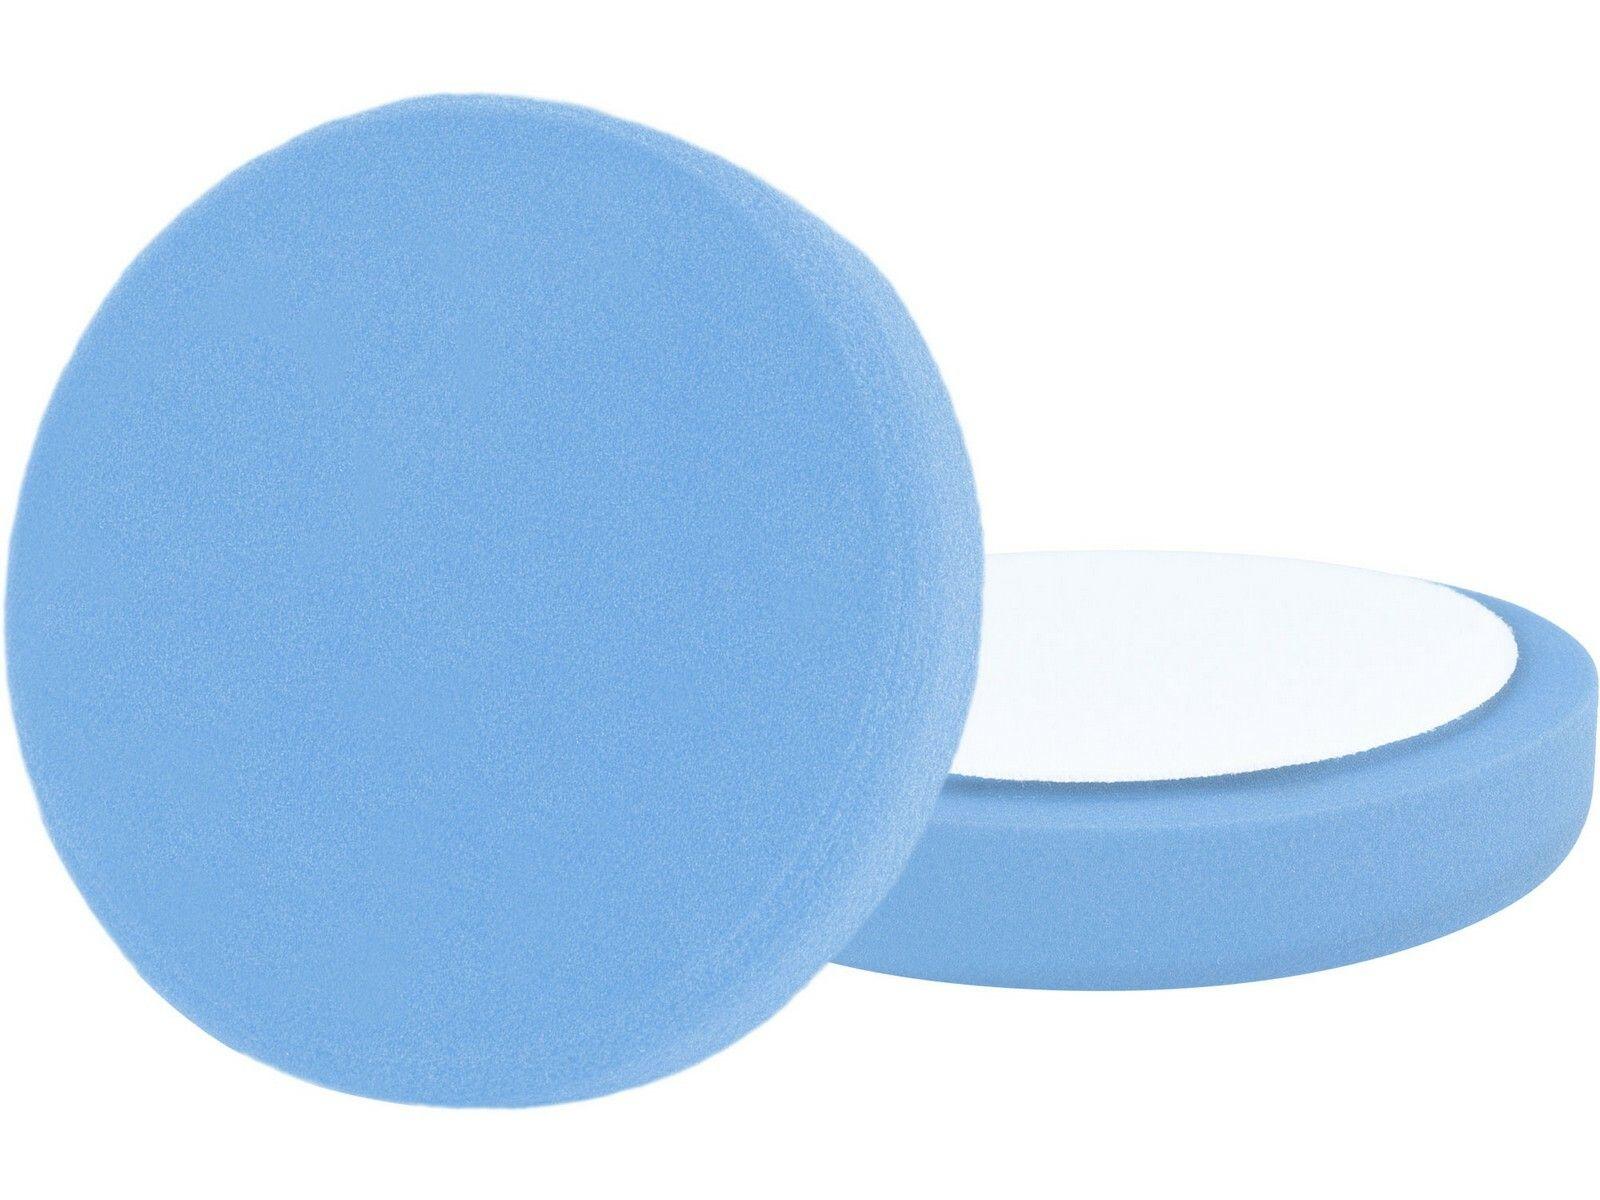 Kotouč leštící pěnový, T60, modrý, Ř180x30mm, suchý zip Ř150mm EXTOL PREMIUM